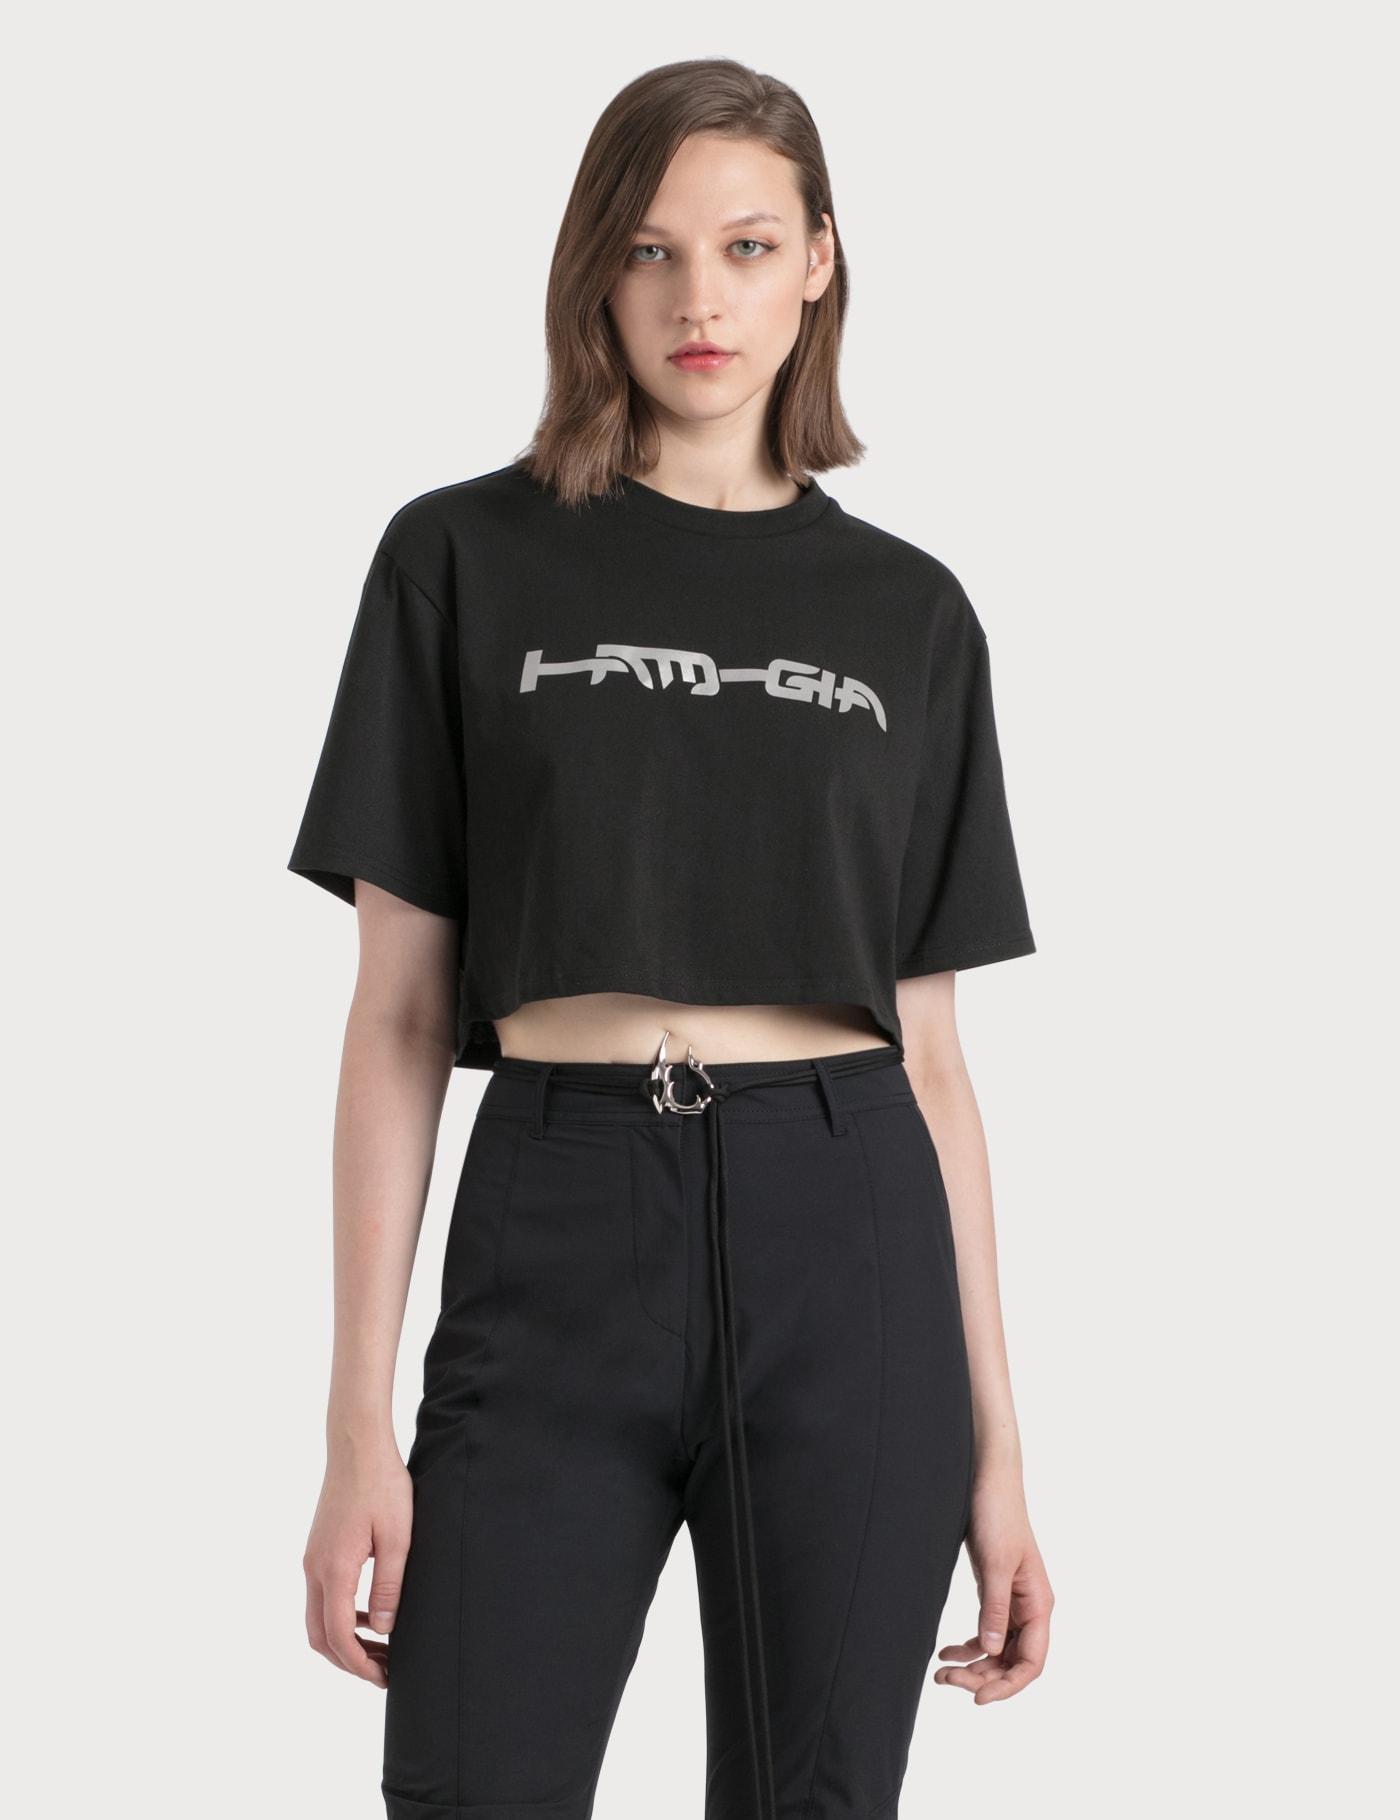 I.AM.GIA Vesta Cropped T-Shirt